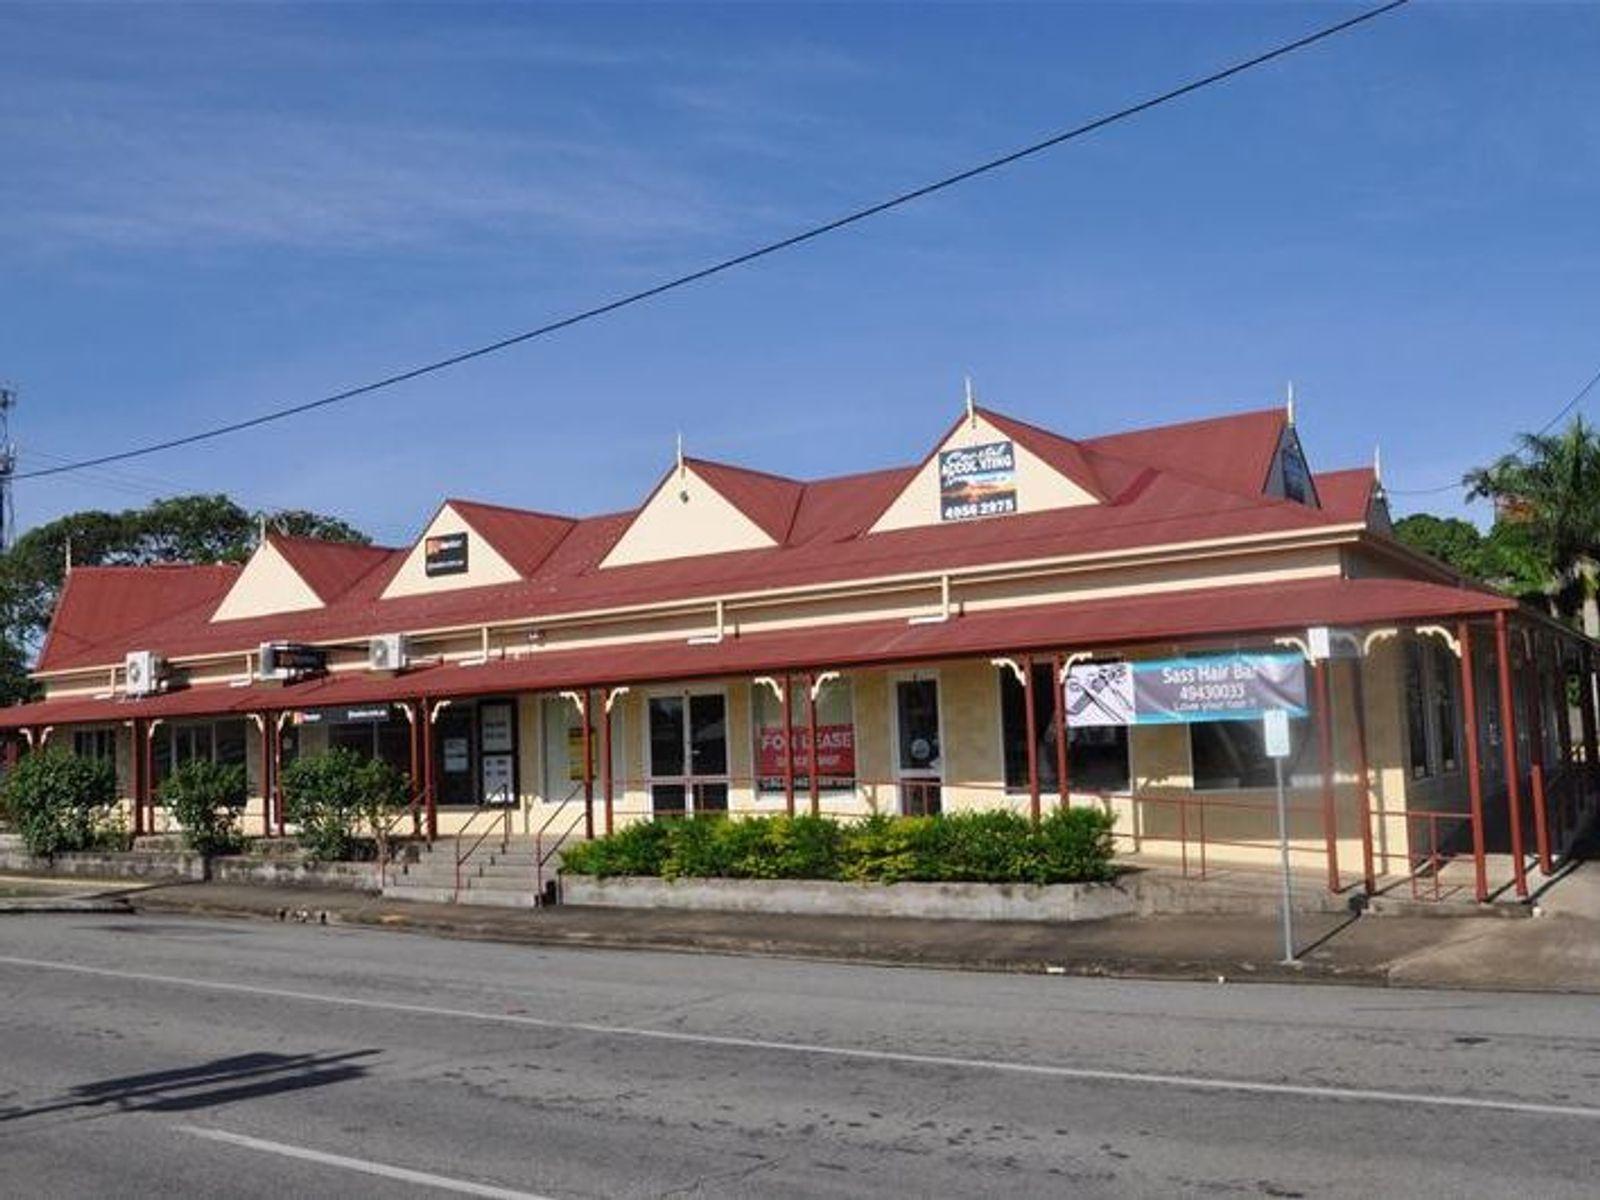 2/71 Broad Street, Sarina, QLD 4737